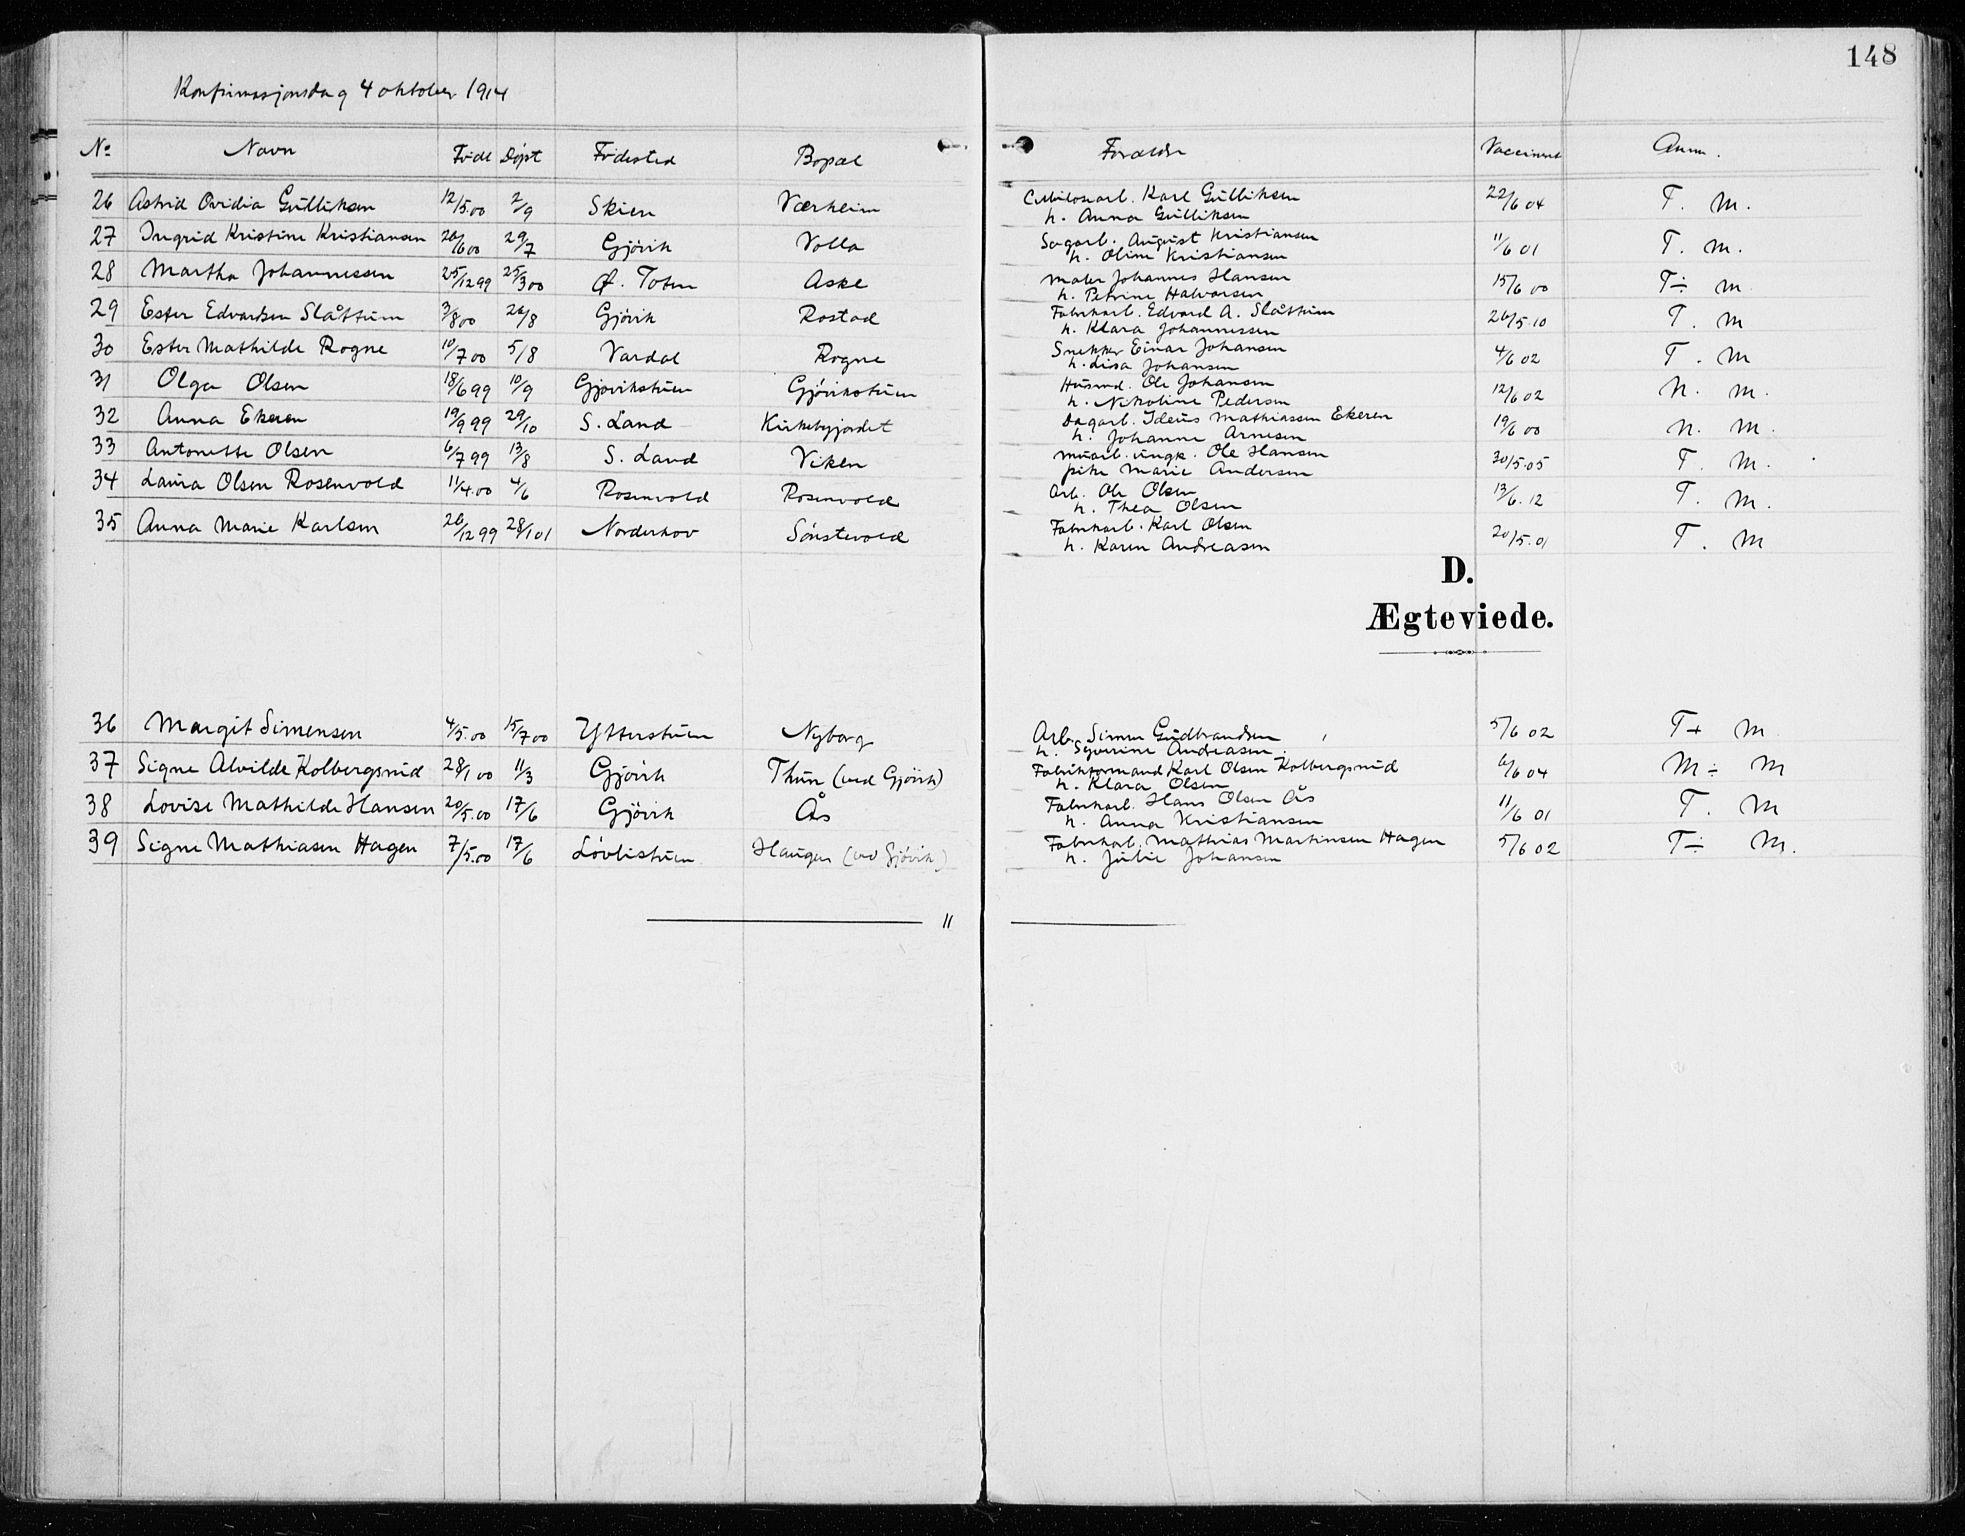 SAH, Vardal prestekontor, H/Ha/Haa/L0016: Ministerialbok nr. 16, 1904-1916, s. 148